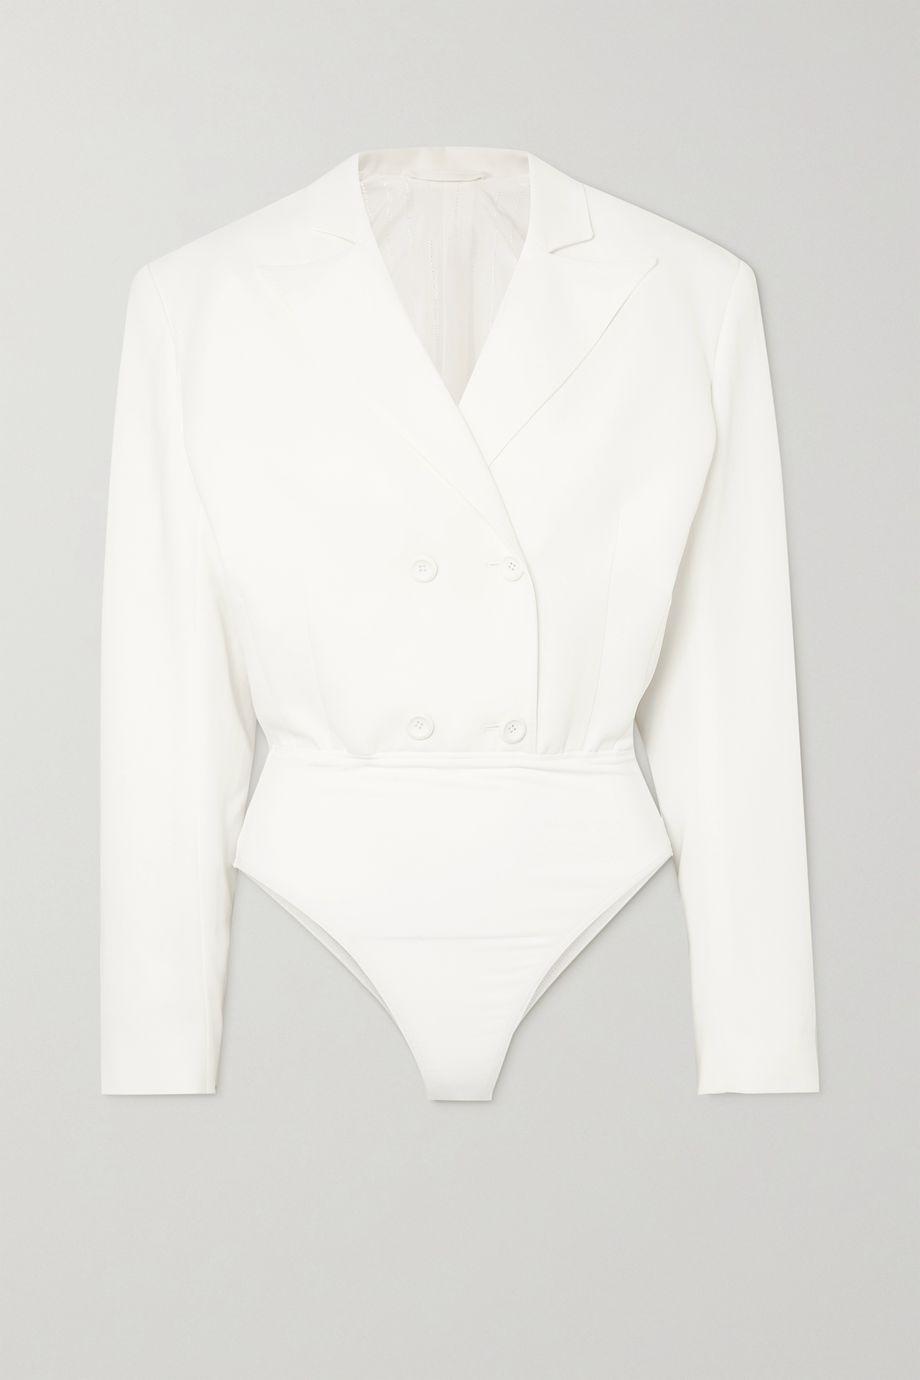 Unravel Project Stretch-cady bodysuit